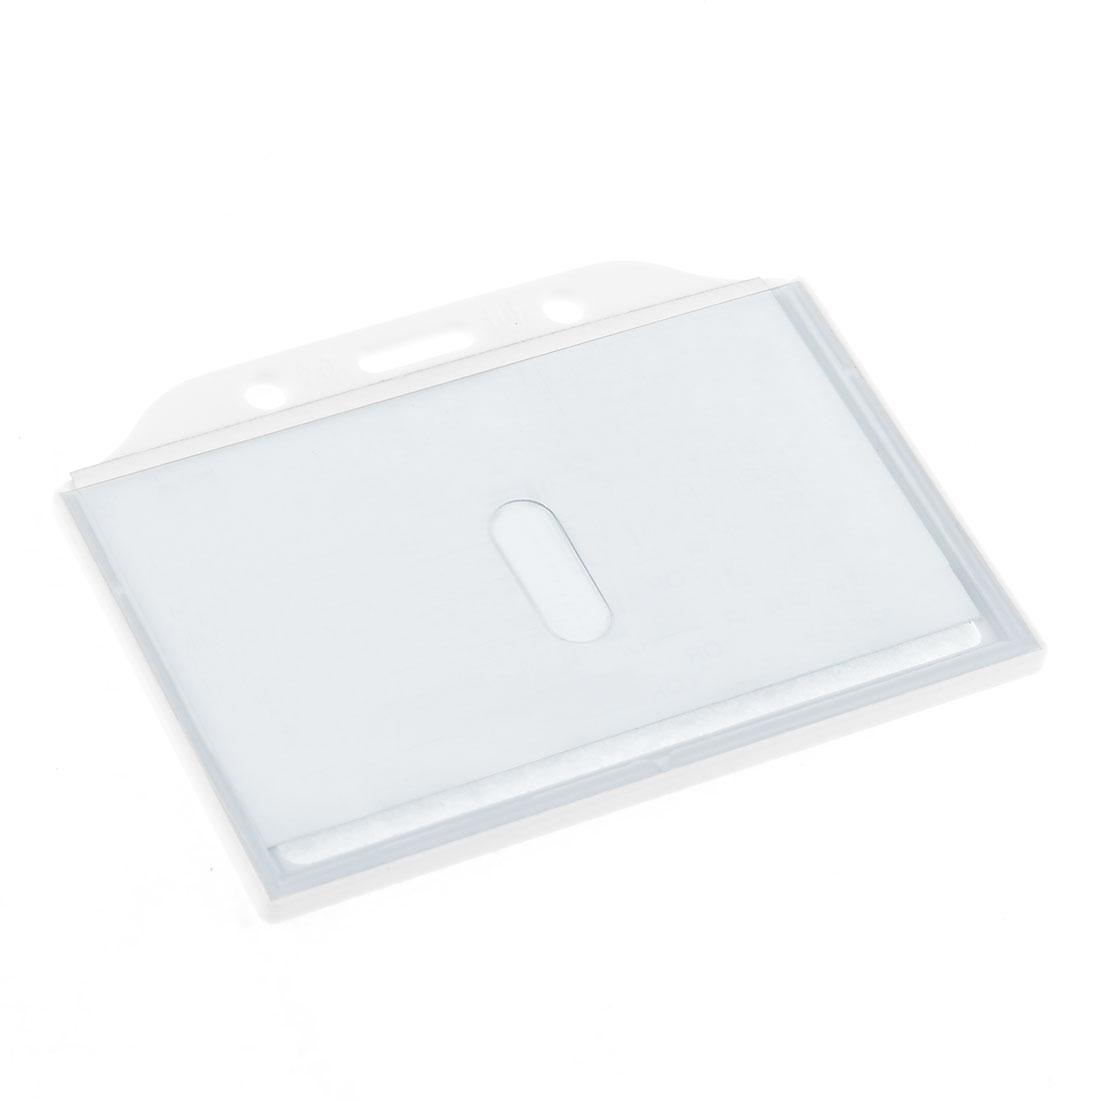 White Clear Hard Plastic Office Horizontal Work Card Holder